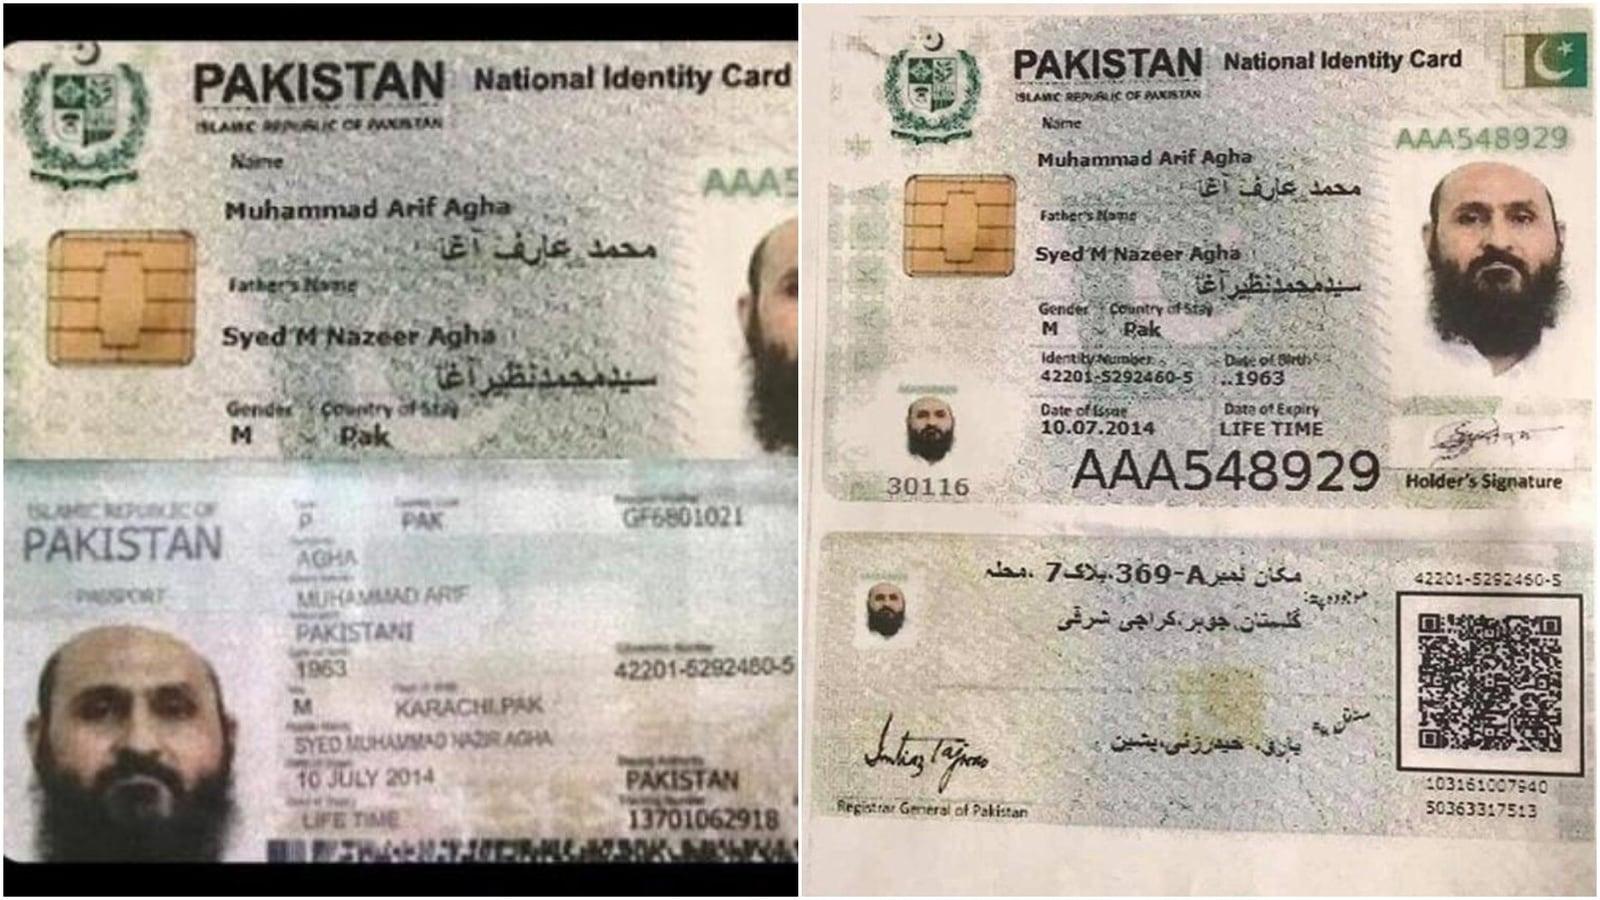 Photo of Mullah Baradar's passport reveals Pak support for Taliban | Shishir Gupta